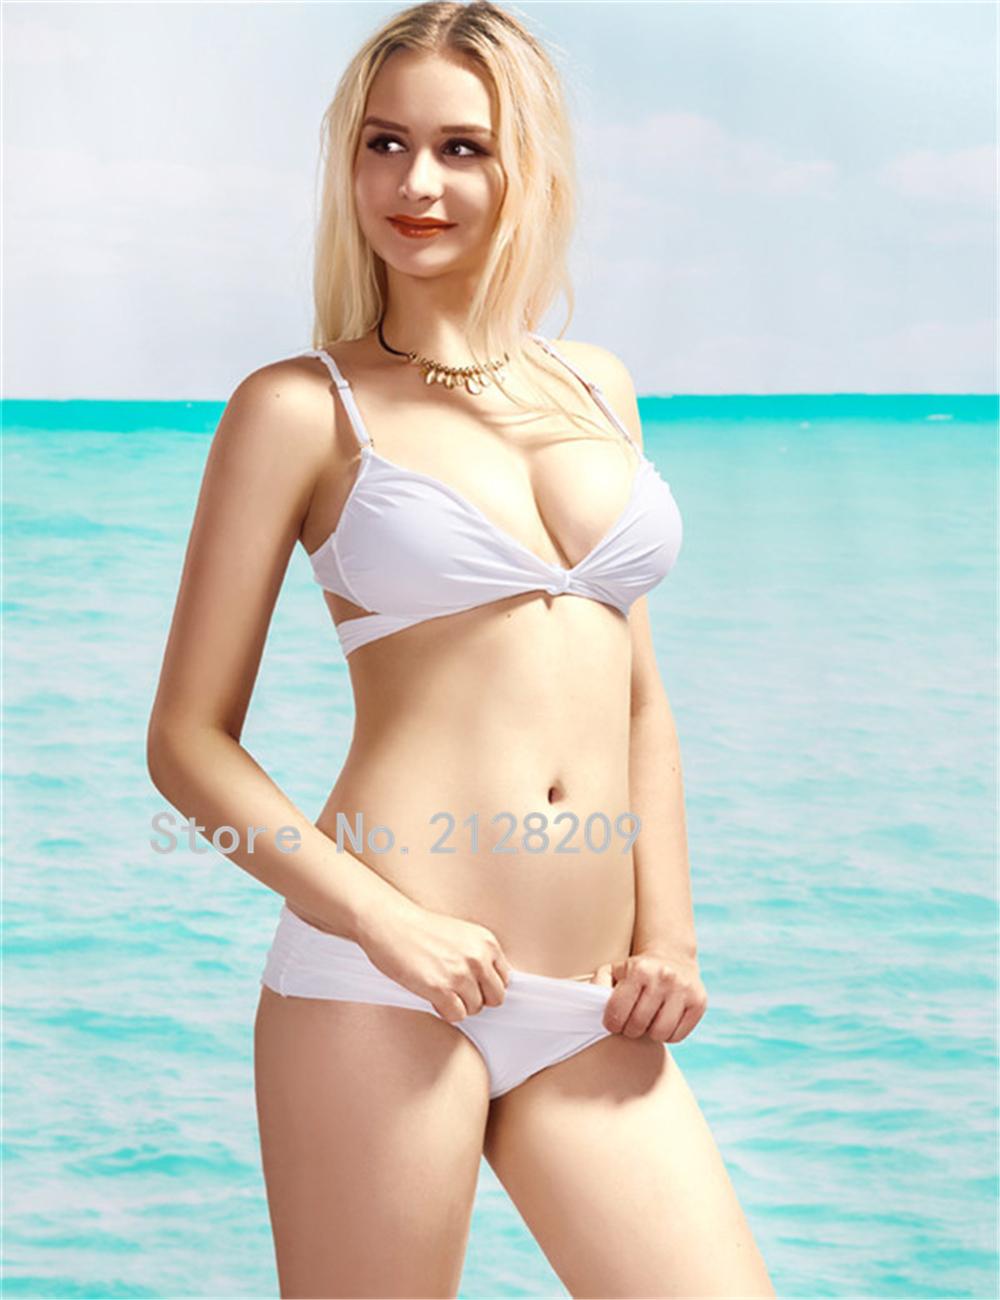 Sexy Bikinis Women Swimsuit Strap Swimwear Bikini Set Bathing Suit tankini Halter Top Buiqini Summer Beach Wear plavky SH-DY-10(China (Mainland))